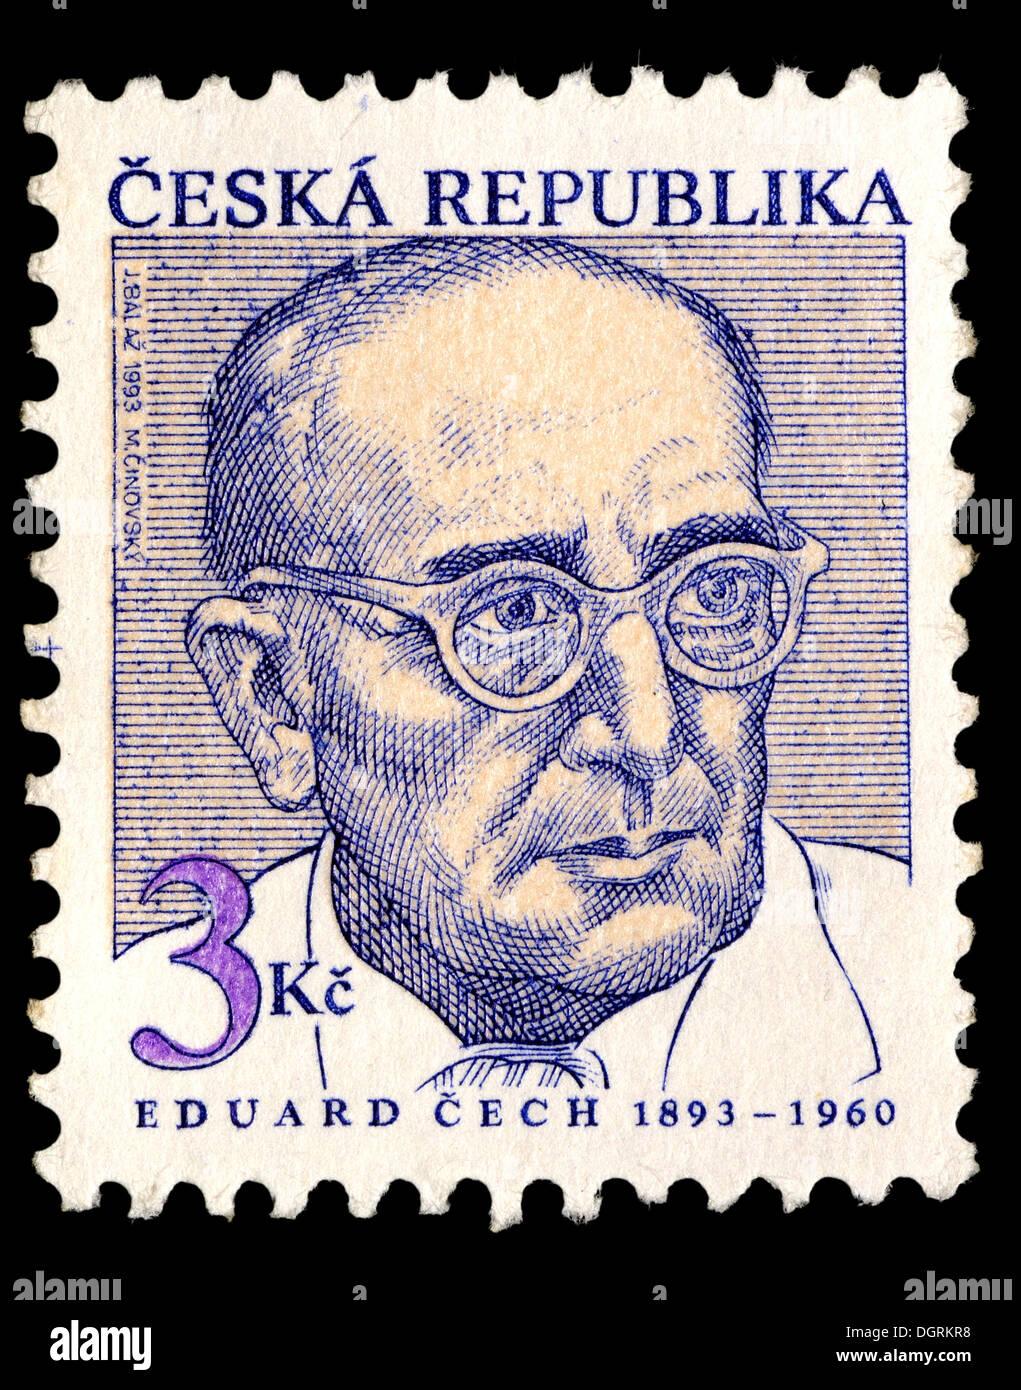 Postage stamp from Czech Republic - Eduard Cech (1893-1960) Czech mathematician - Stock Image